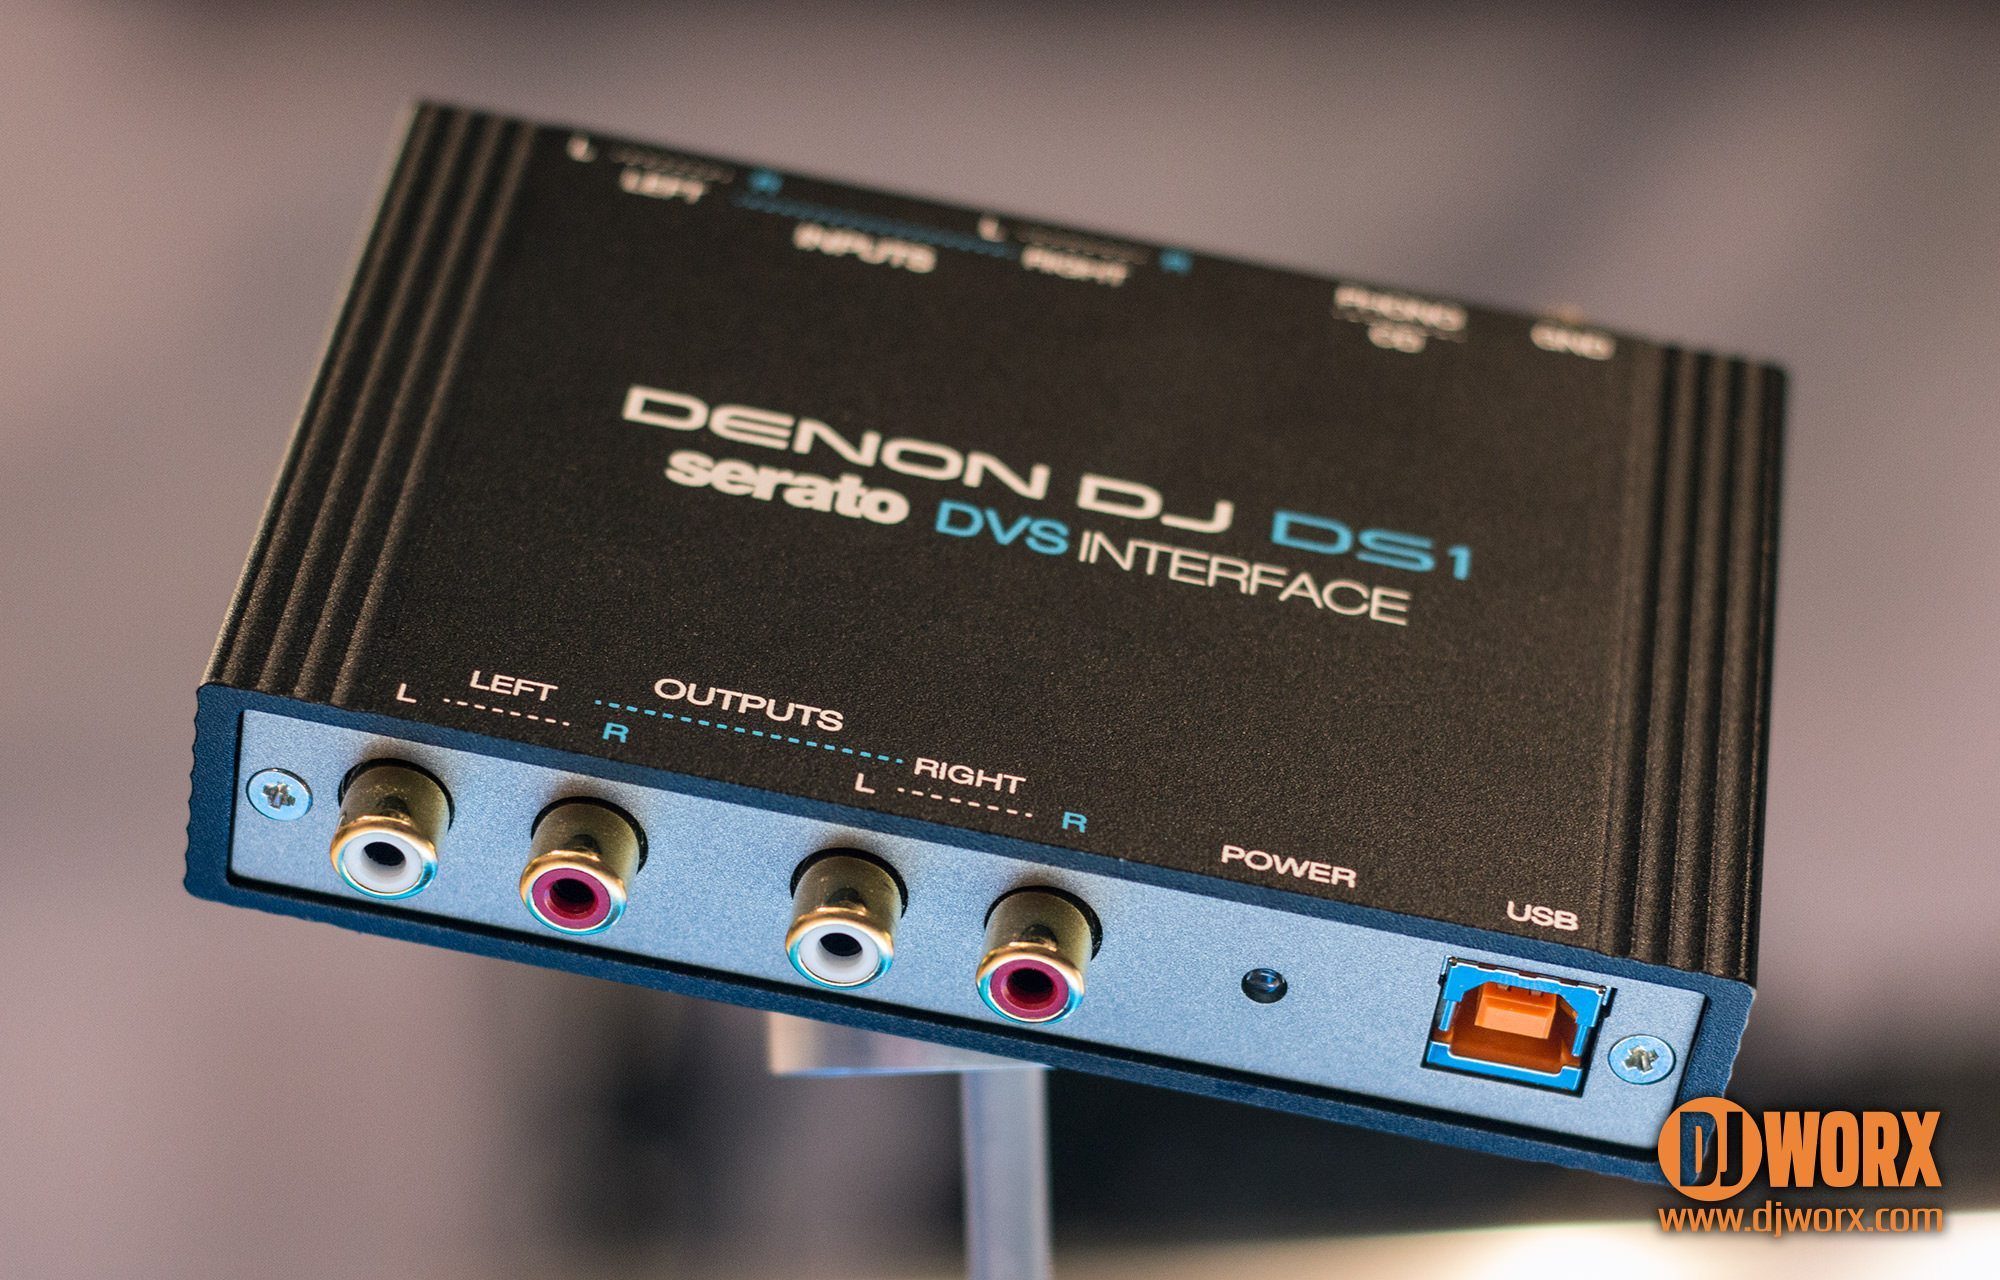 Denon DJ DS1 Serato Interface NAMM 2015 (1)